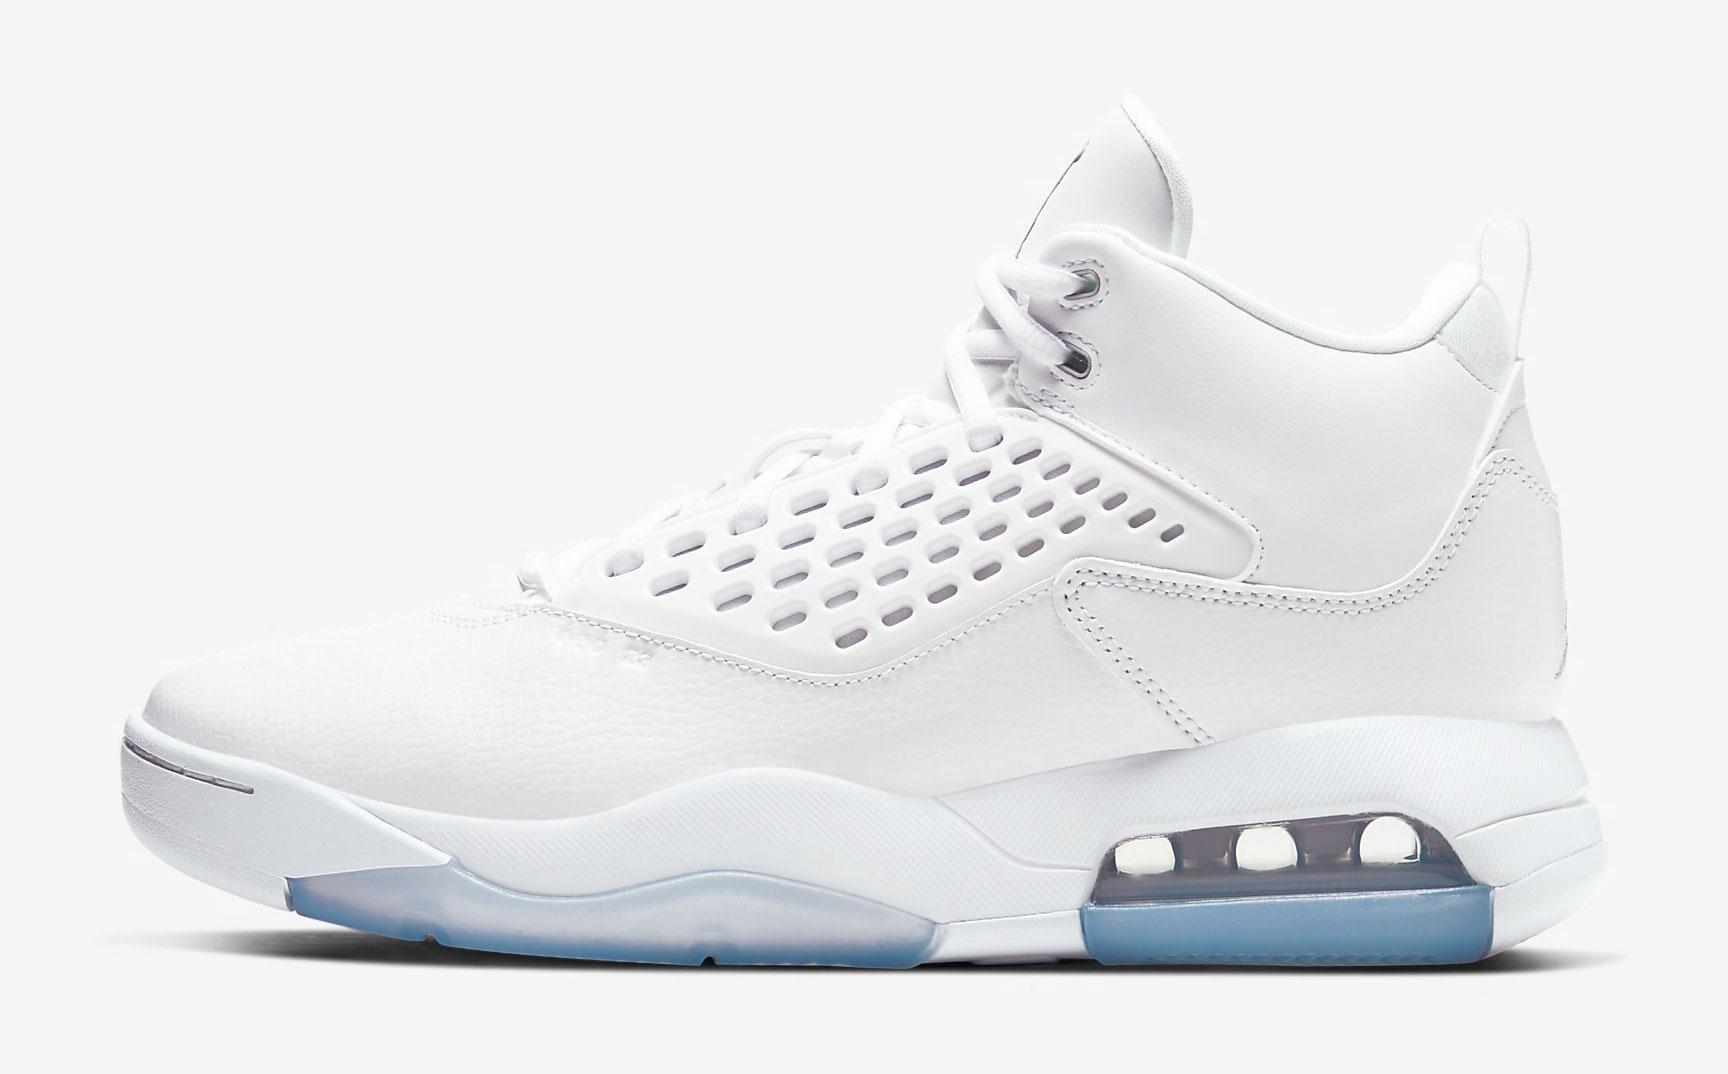 jordan-maxin-200-white-silver-release-date